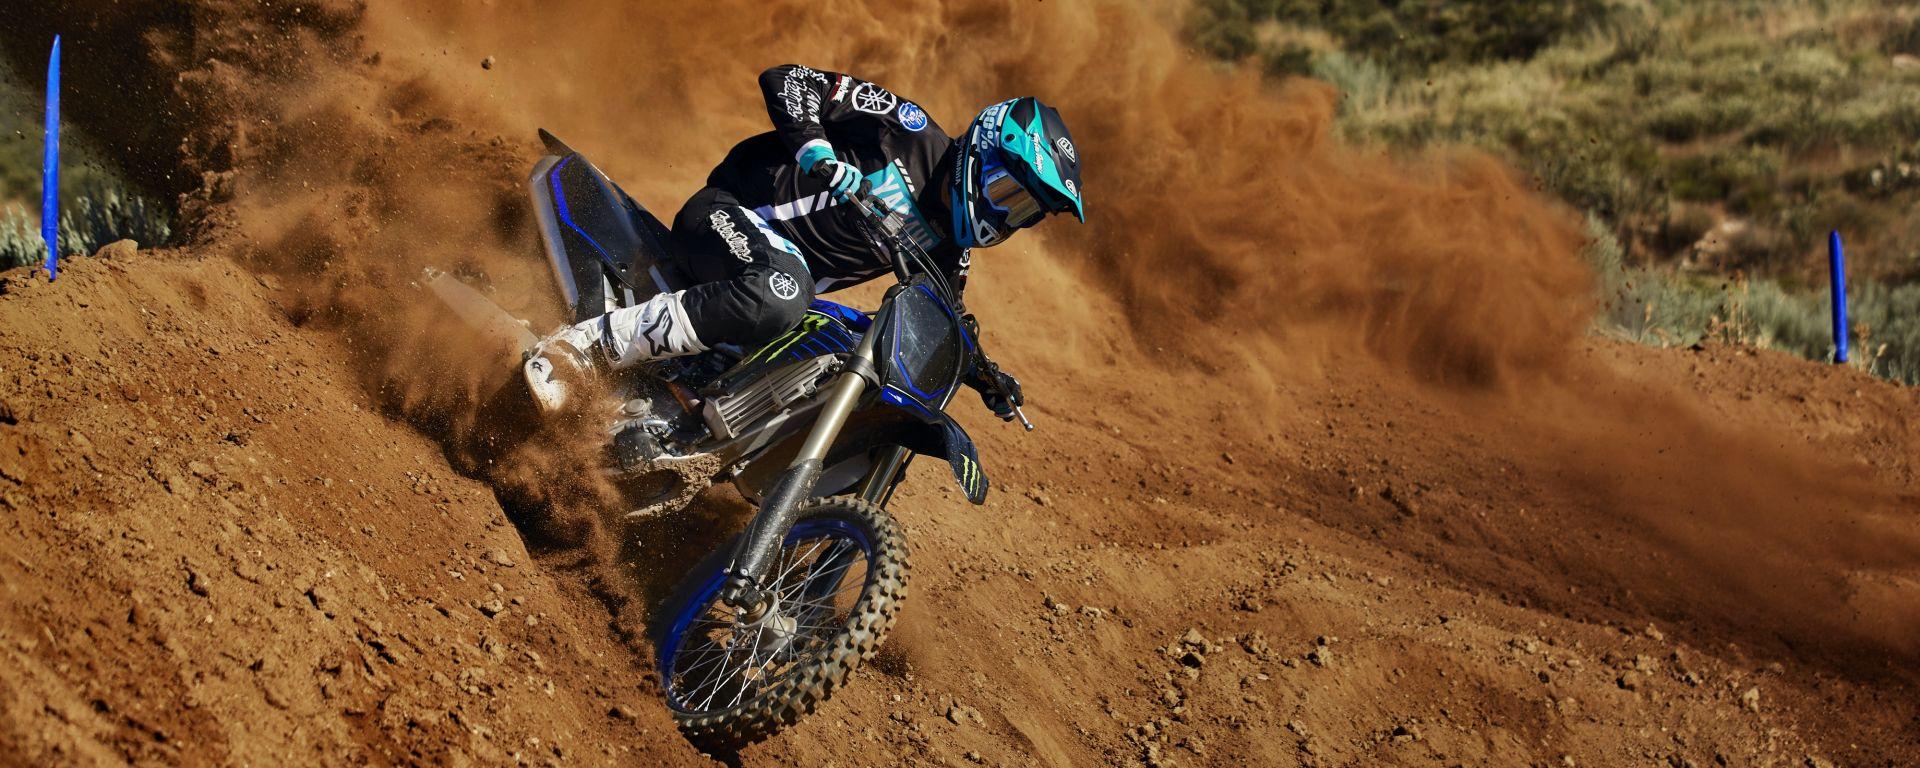 Yamaha, gamma cross 2021: nuova YZ250F e livree Monster Energy